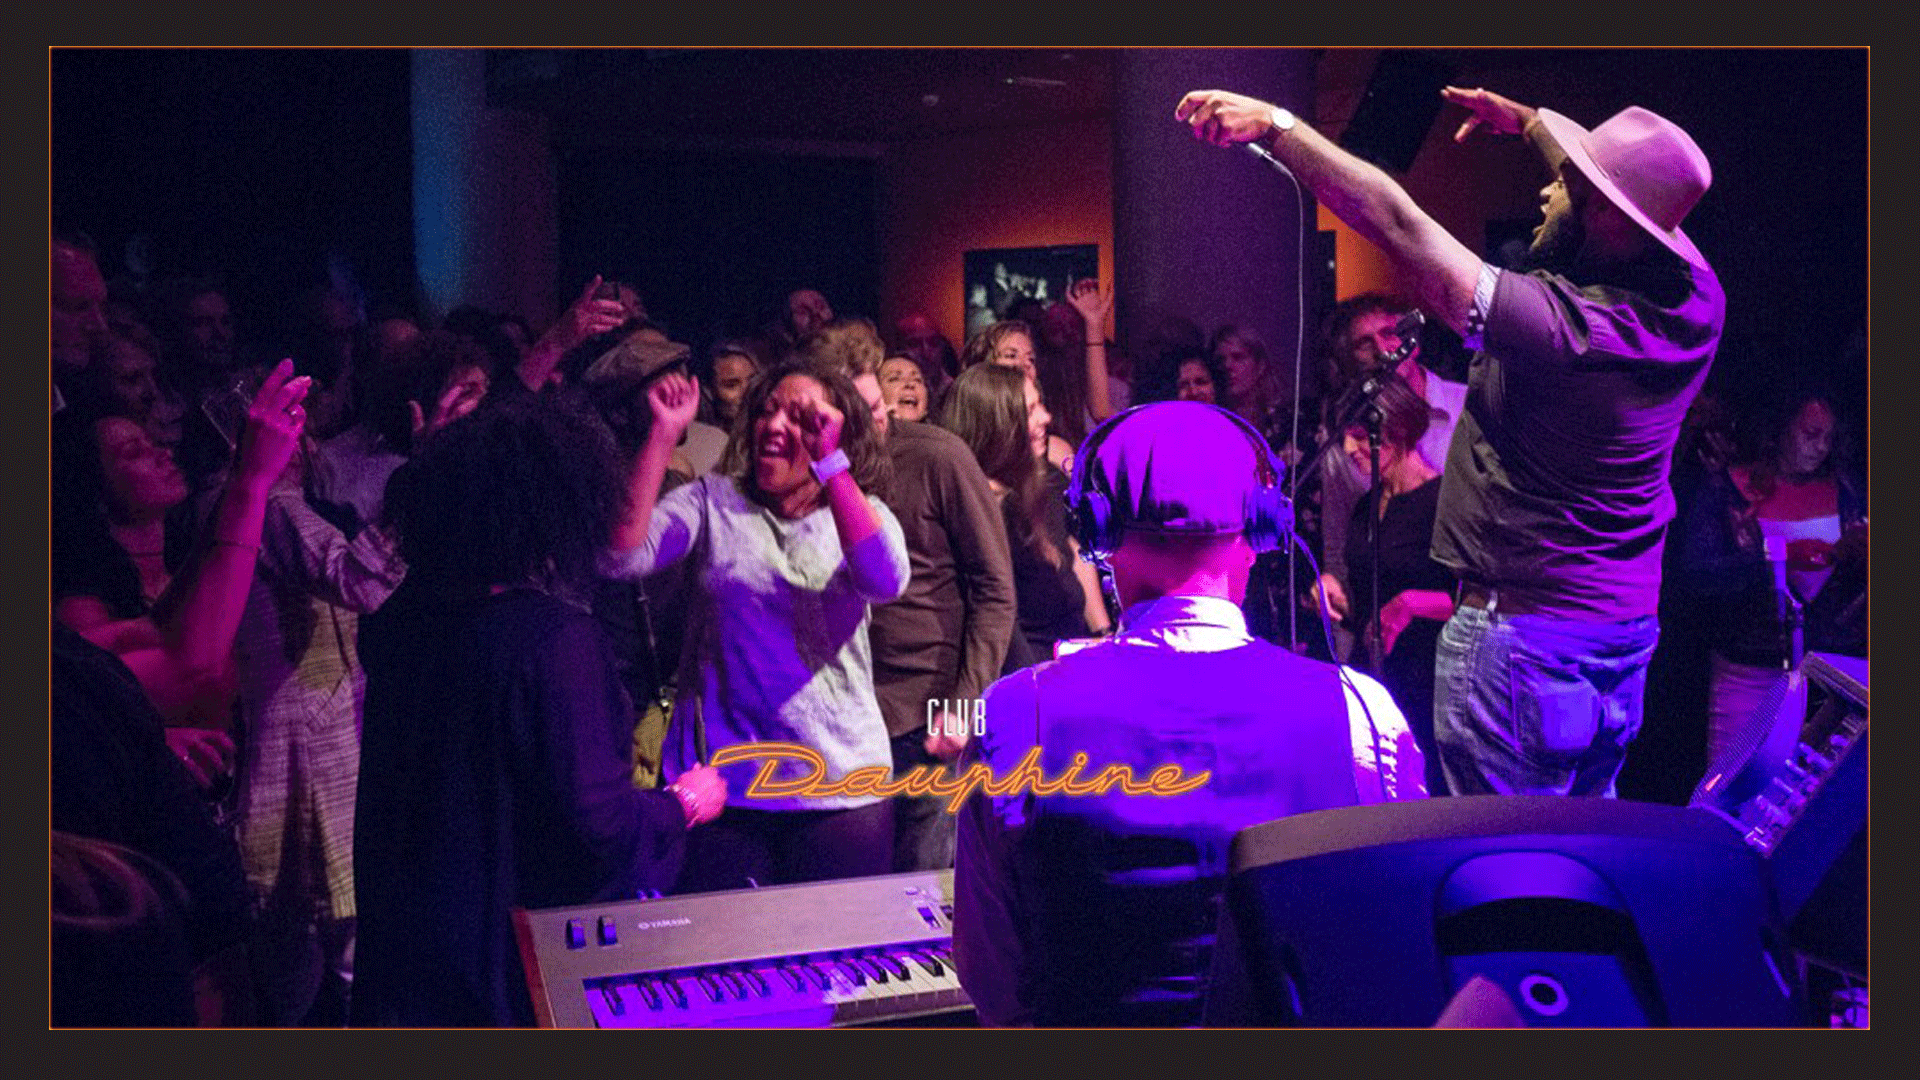 Club Dauphine – Friday Night Live – 15 Nov